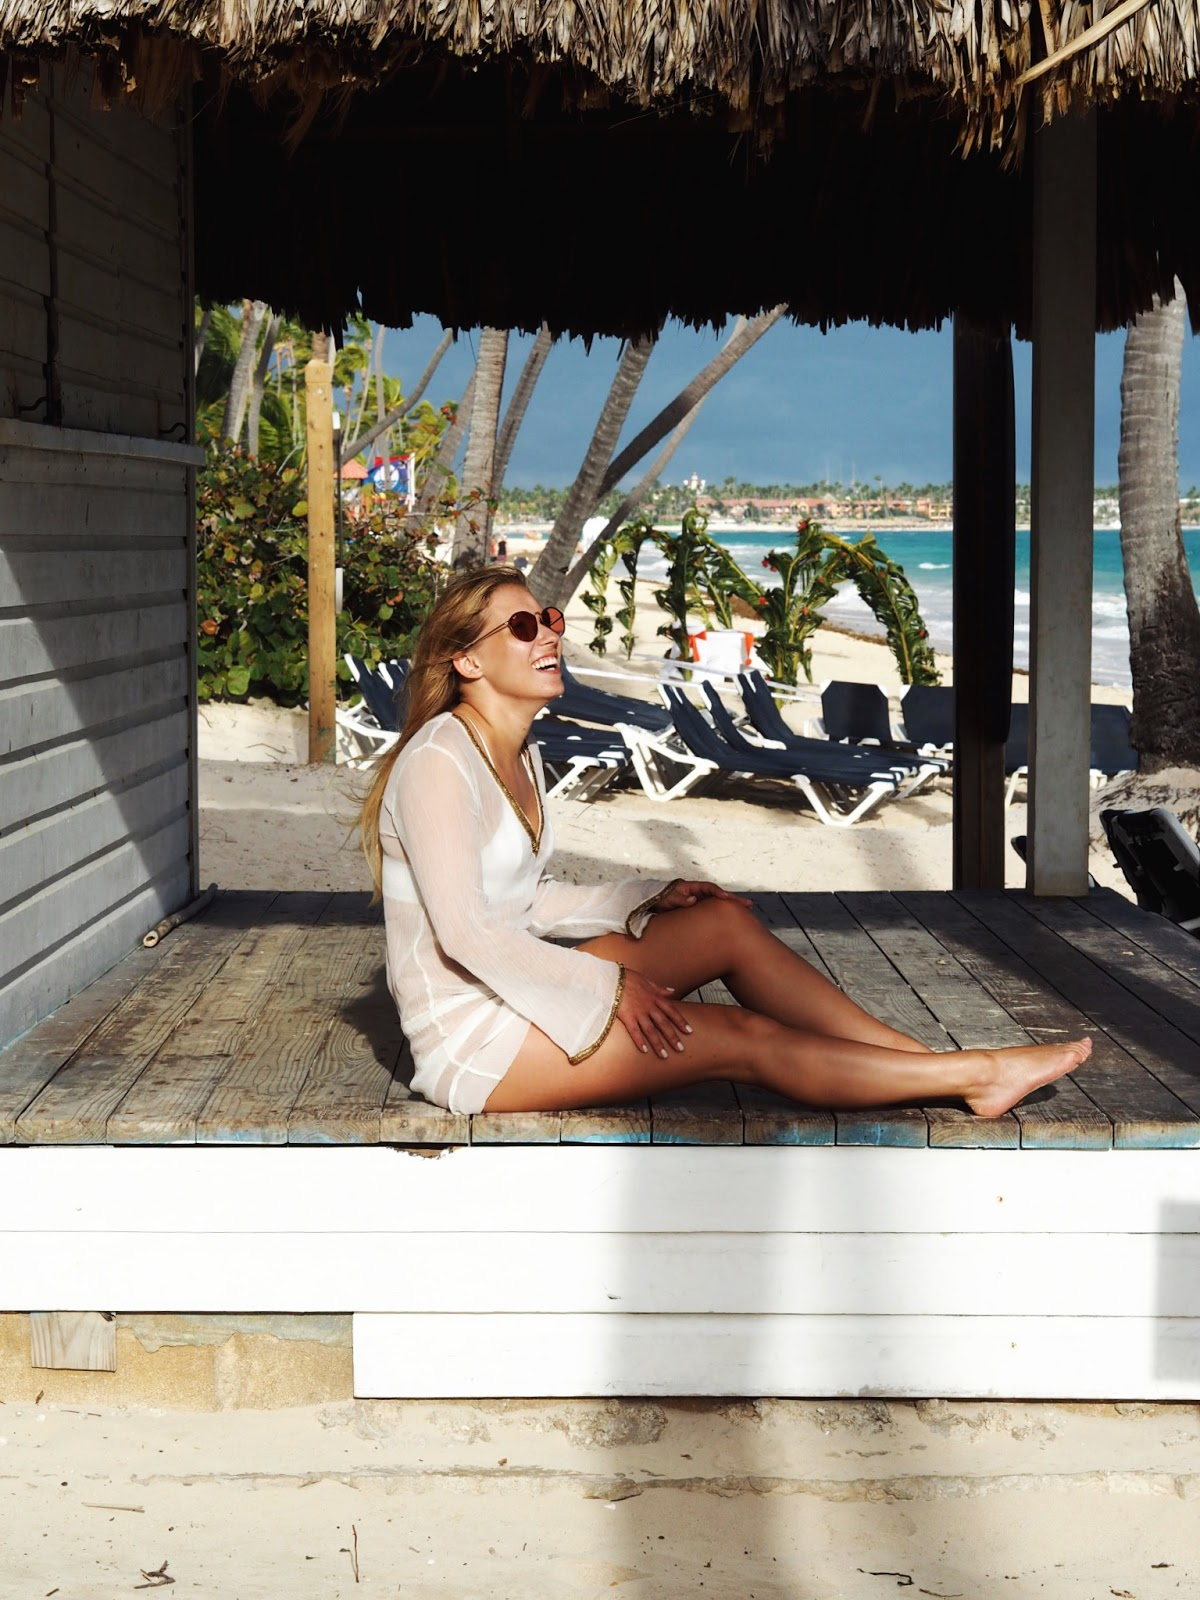 Miss Tunica Perissa Crystal White Tunic Beach Hut Palm Roof